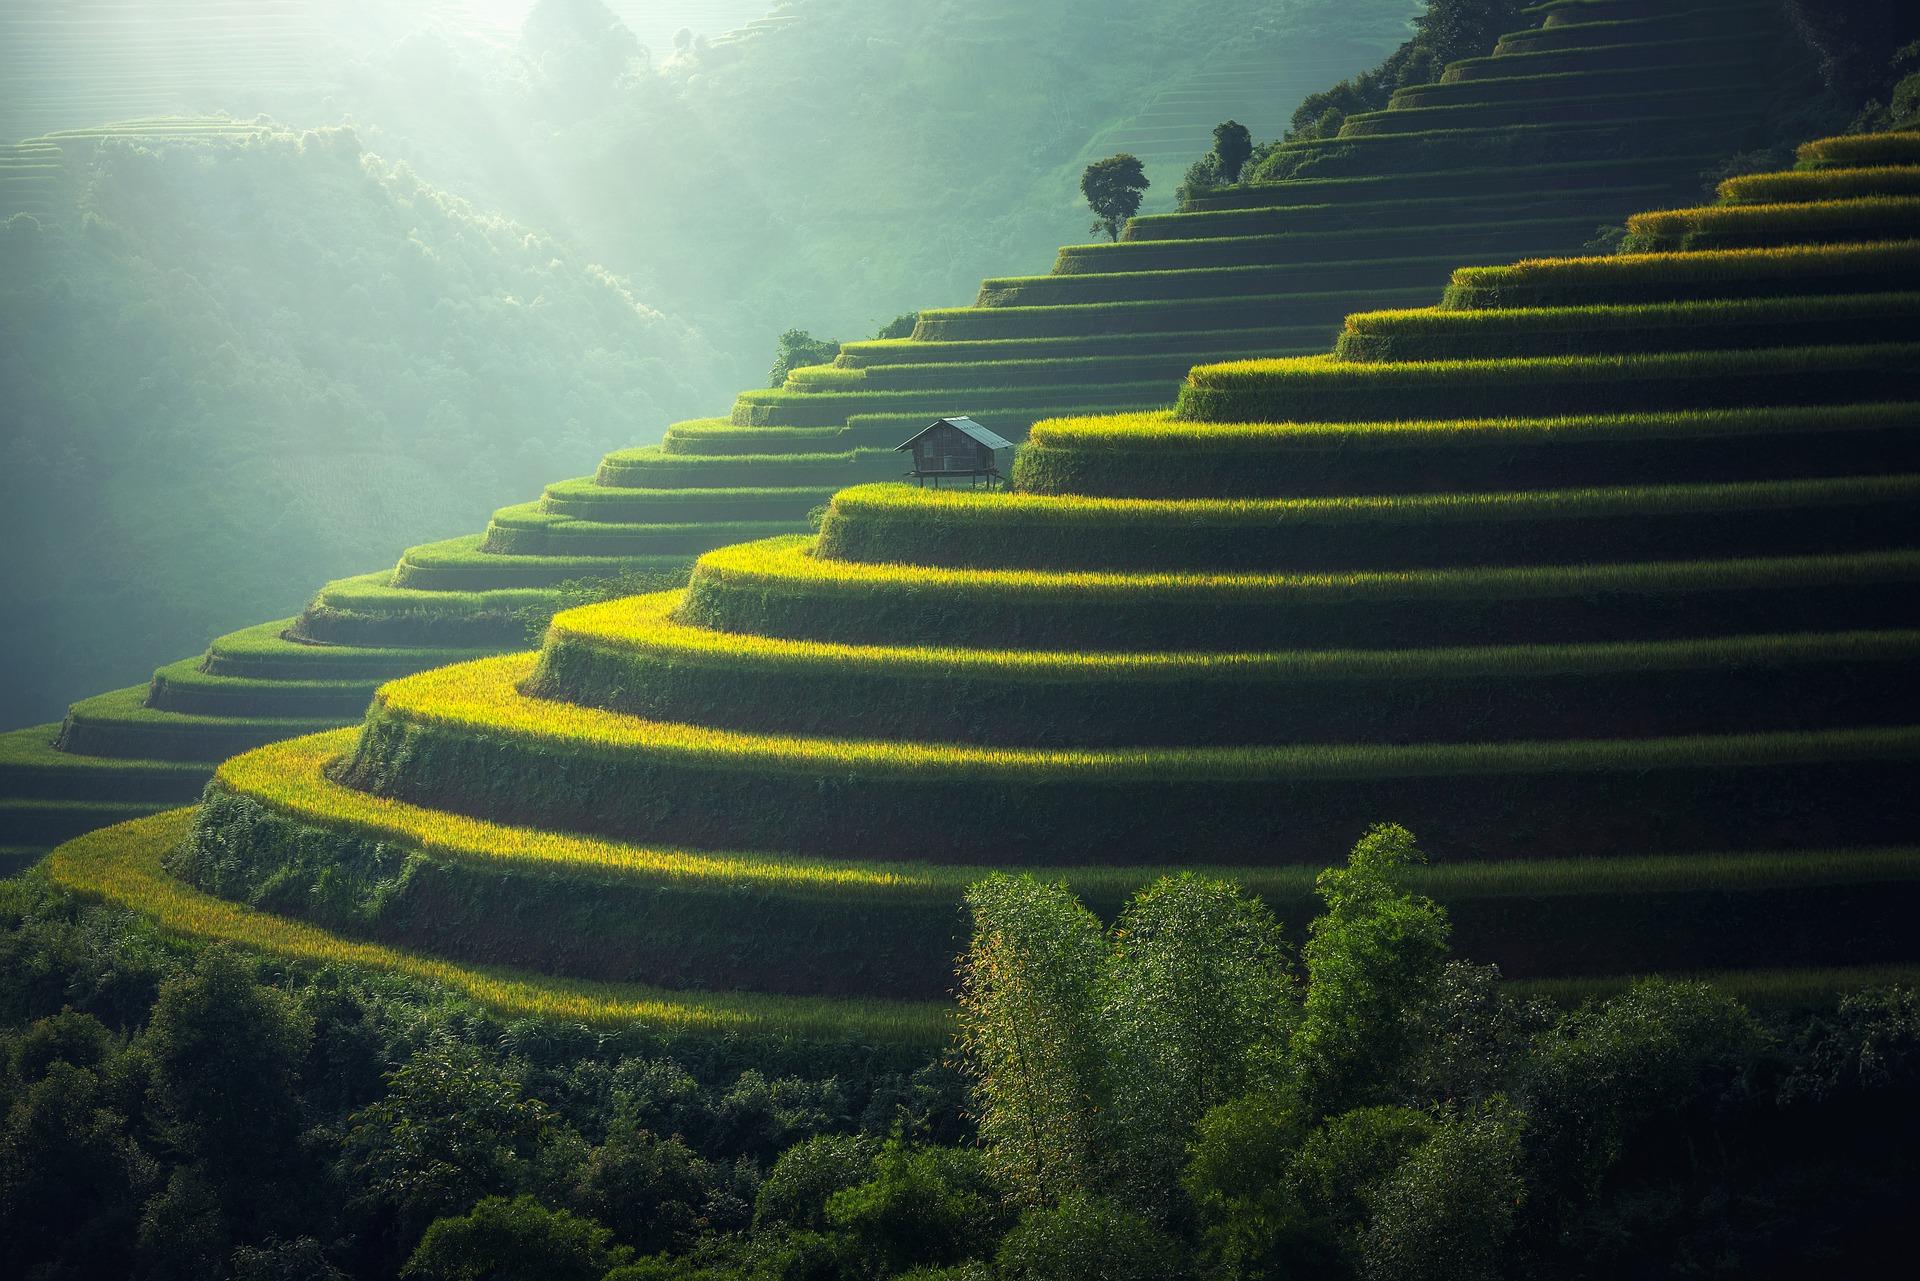 10. Bali, Indonesia -